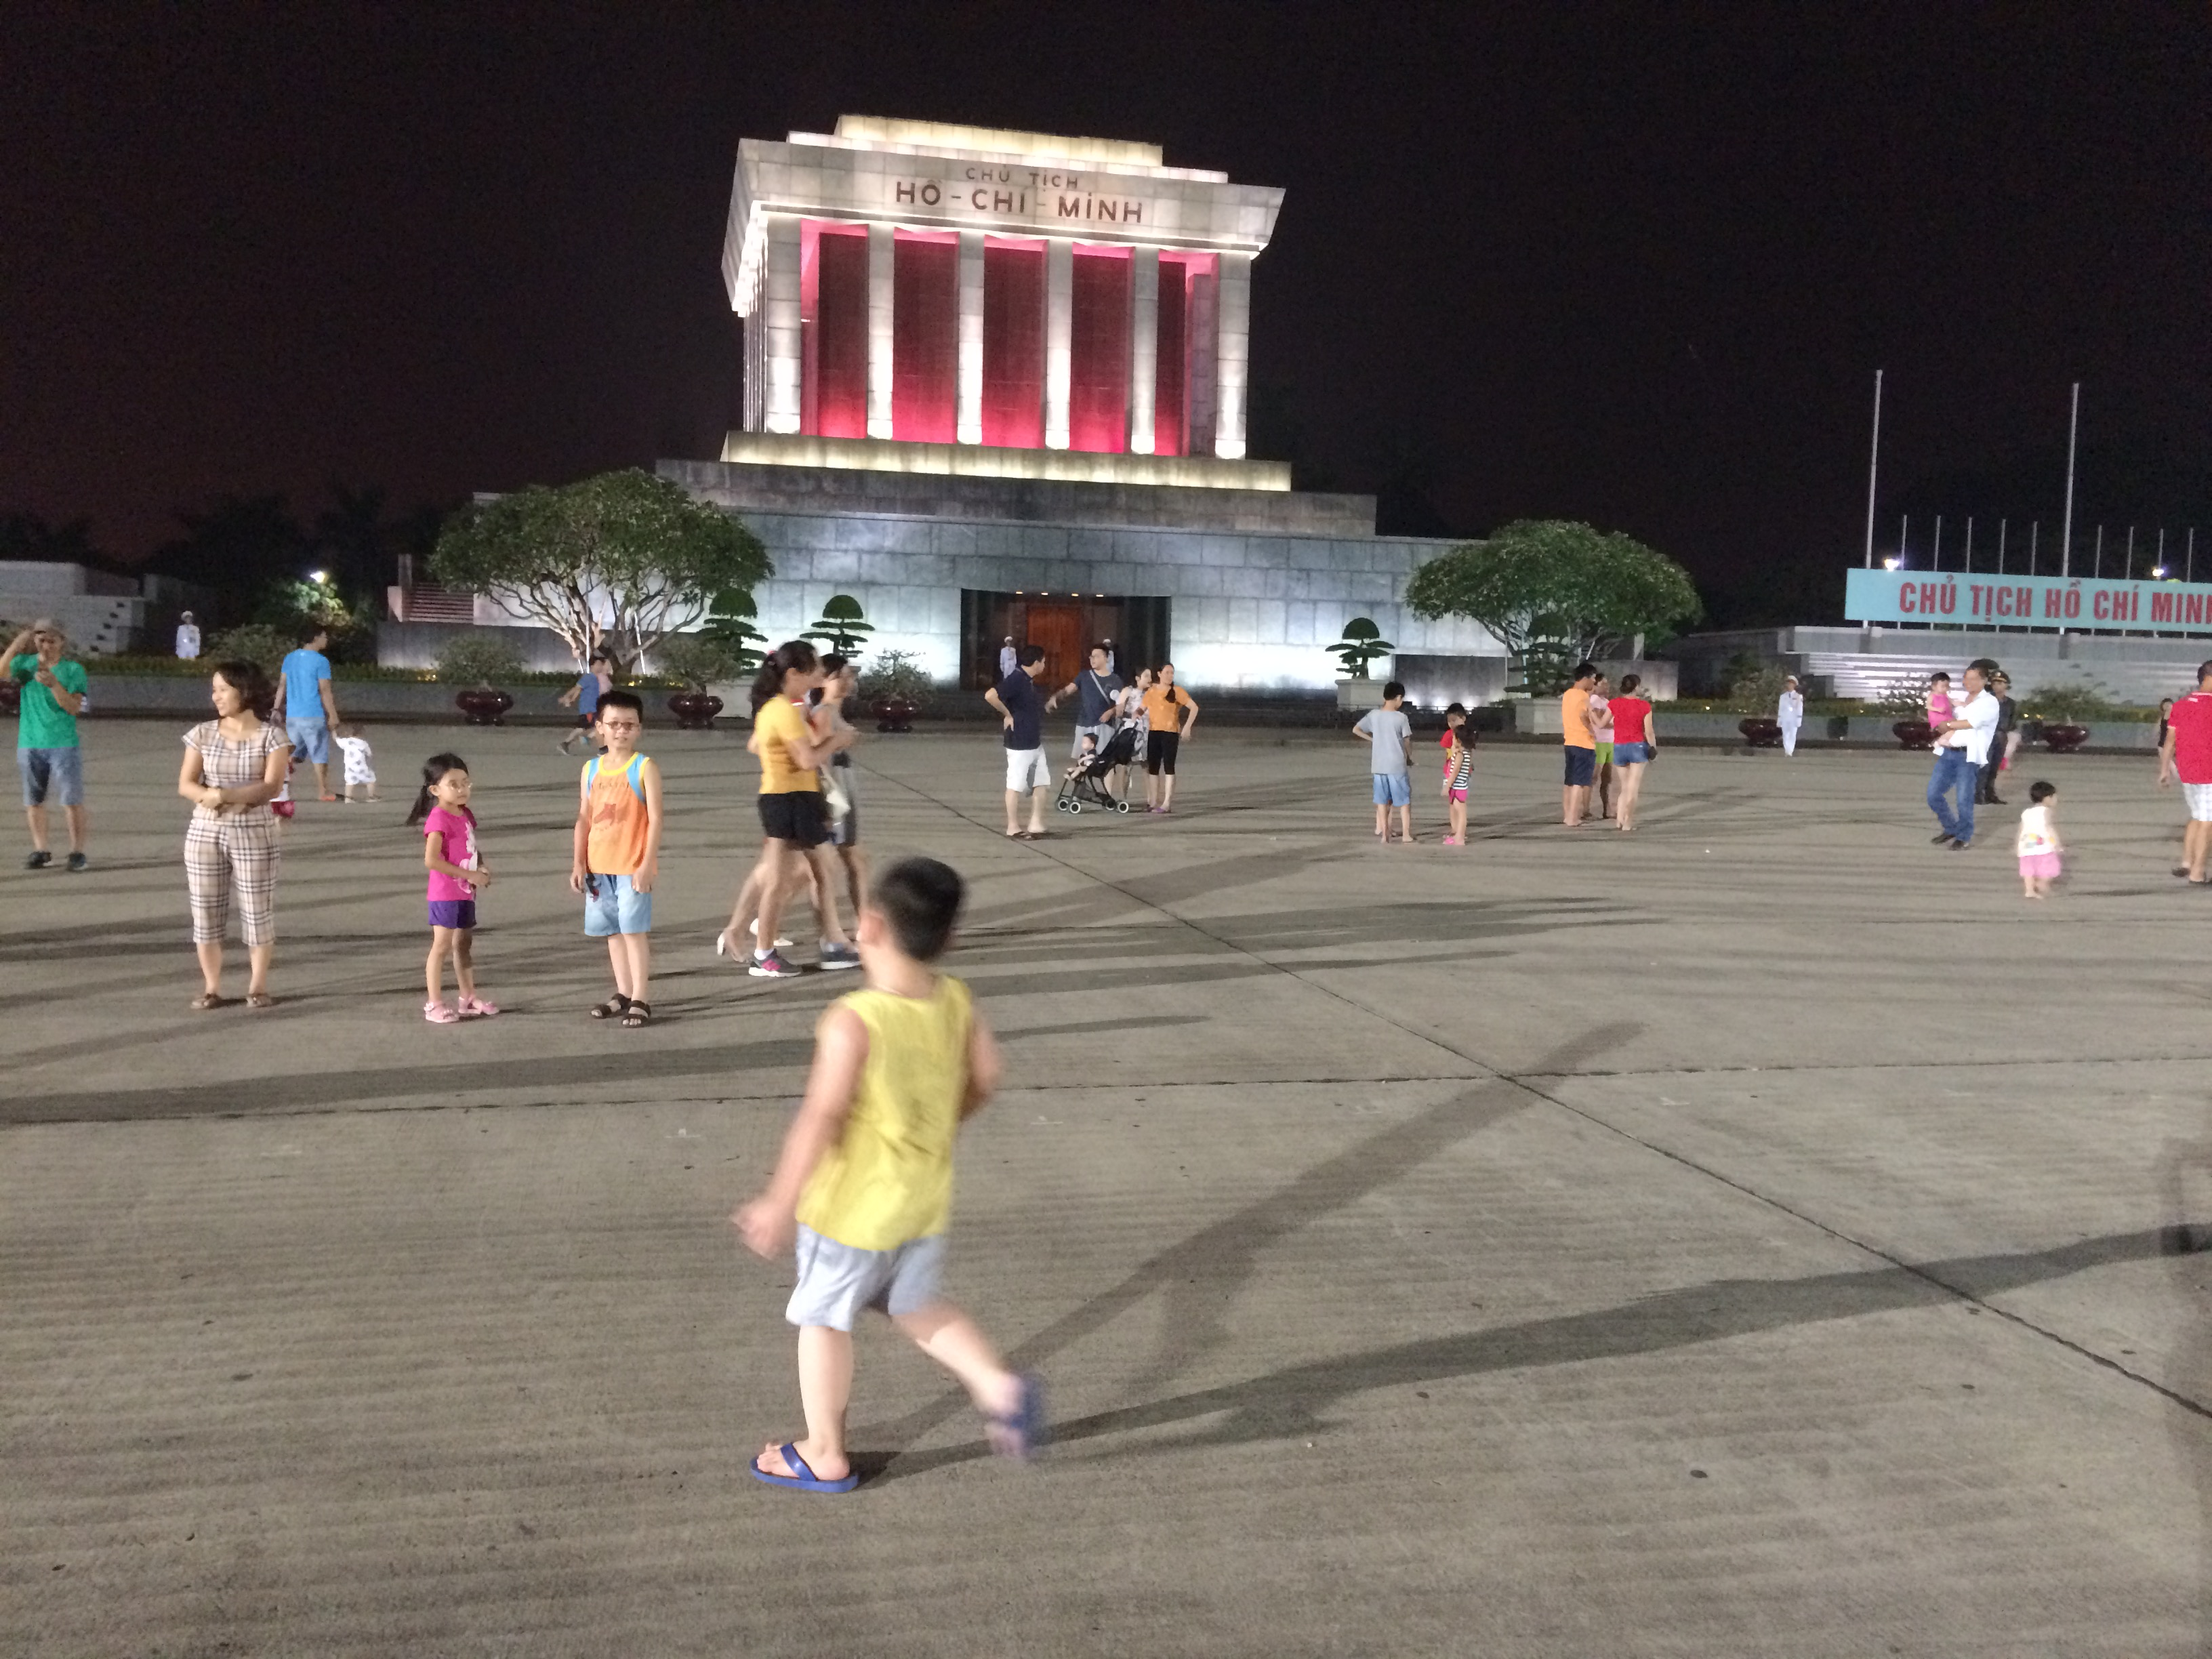 Hanoi: Ho Chi Minh Mausoleum